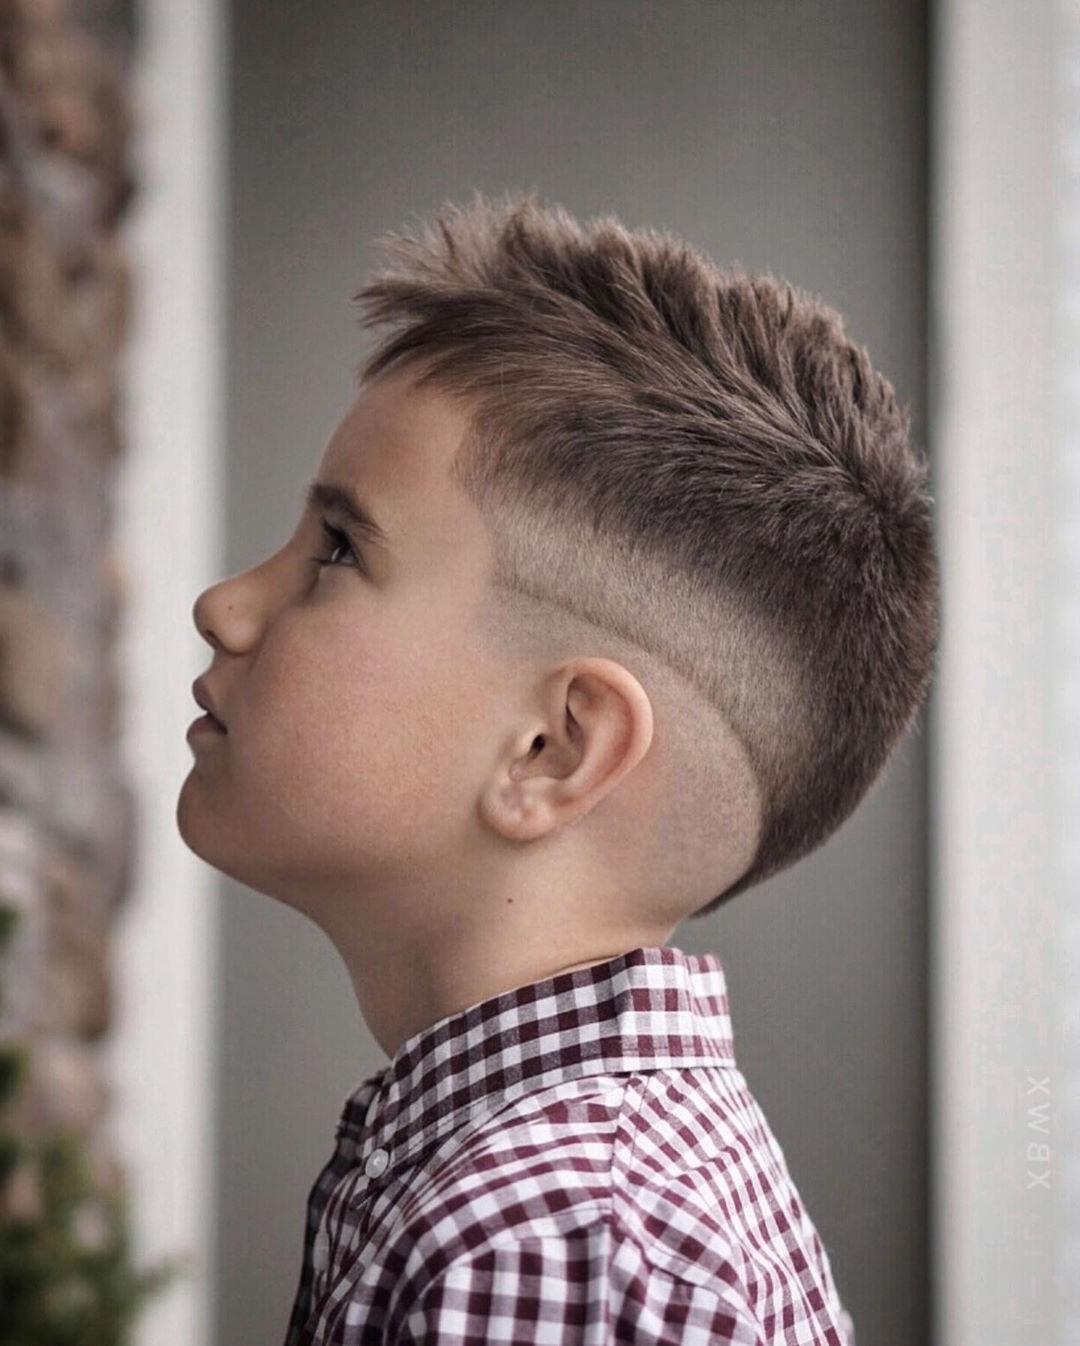 Short Mohawk Undercut for Boys